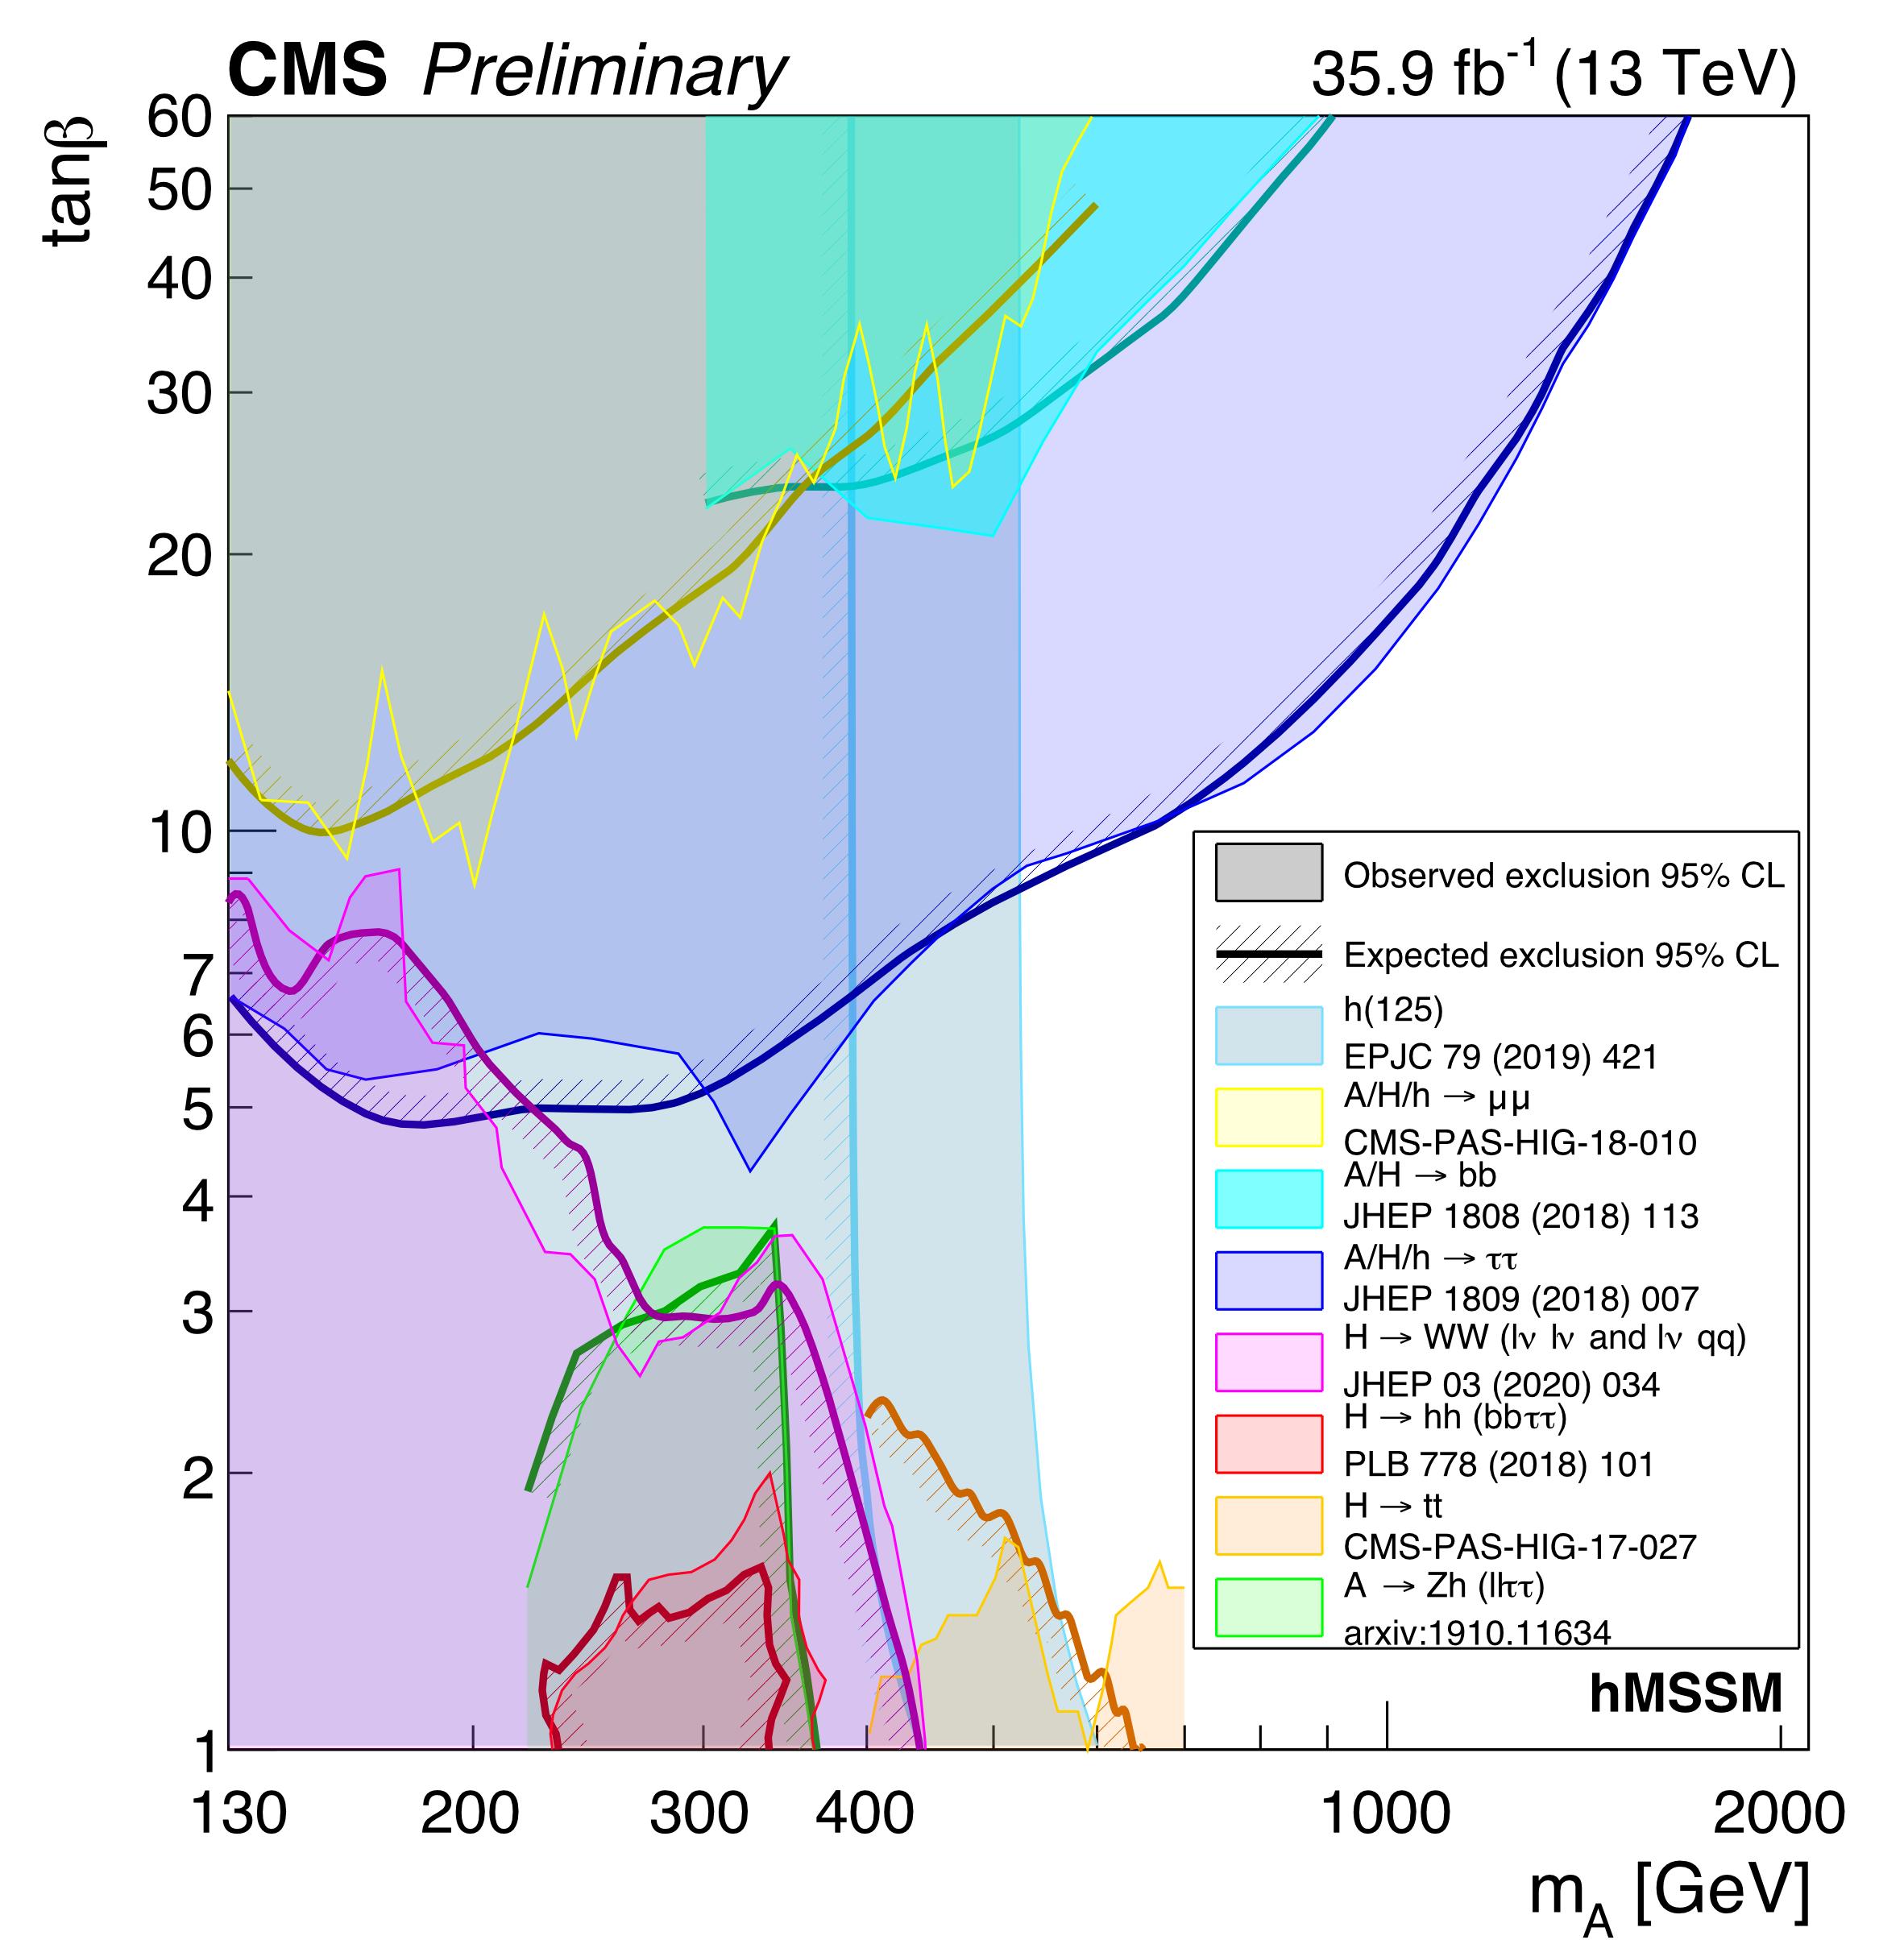 MSSM-hMSSM-summary-plot-2020.png